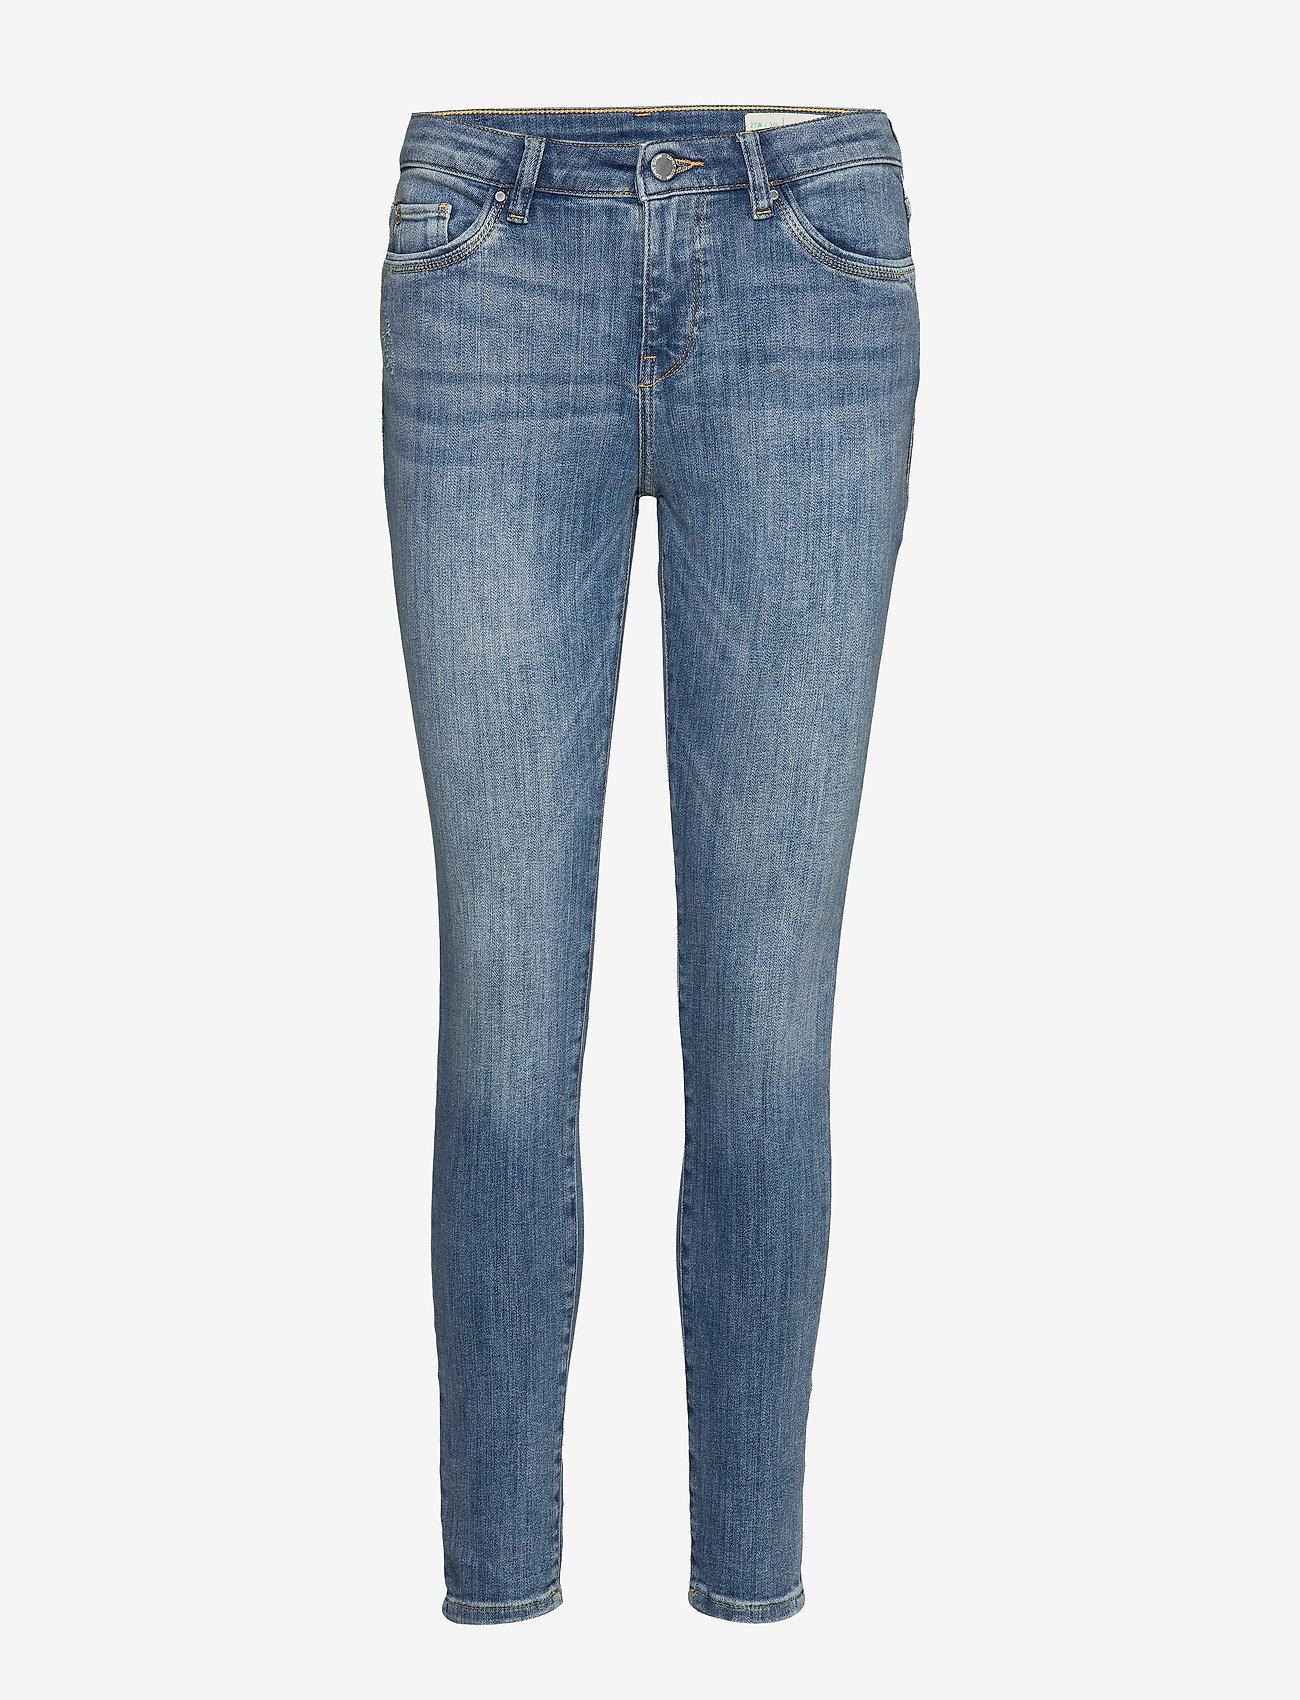 Esprit Casual - Pants denim - skinny jeans - blue light wash - 1